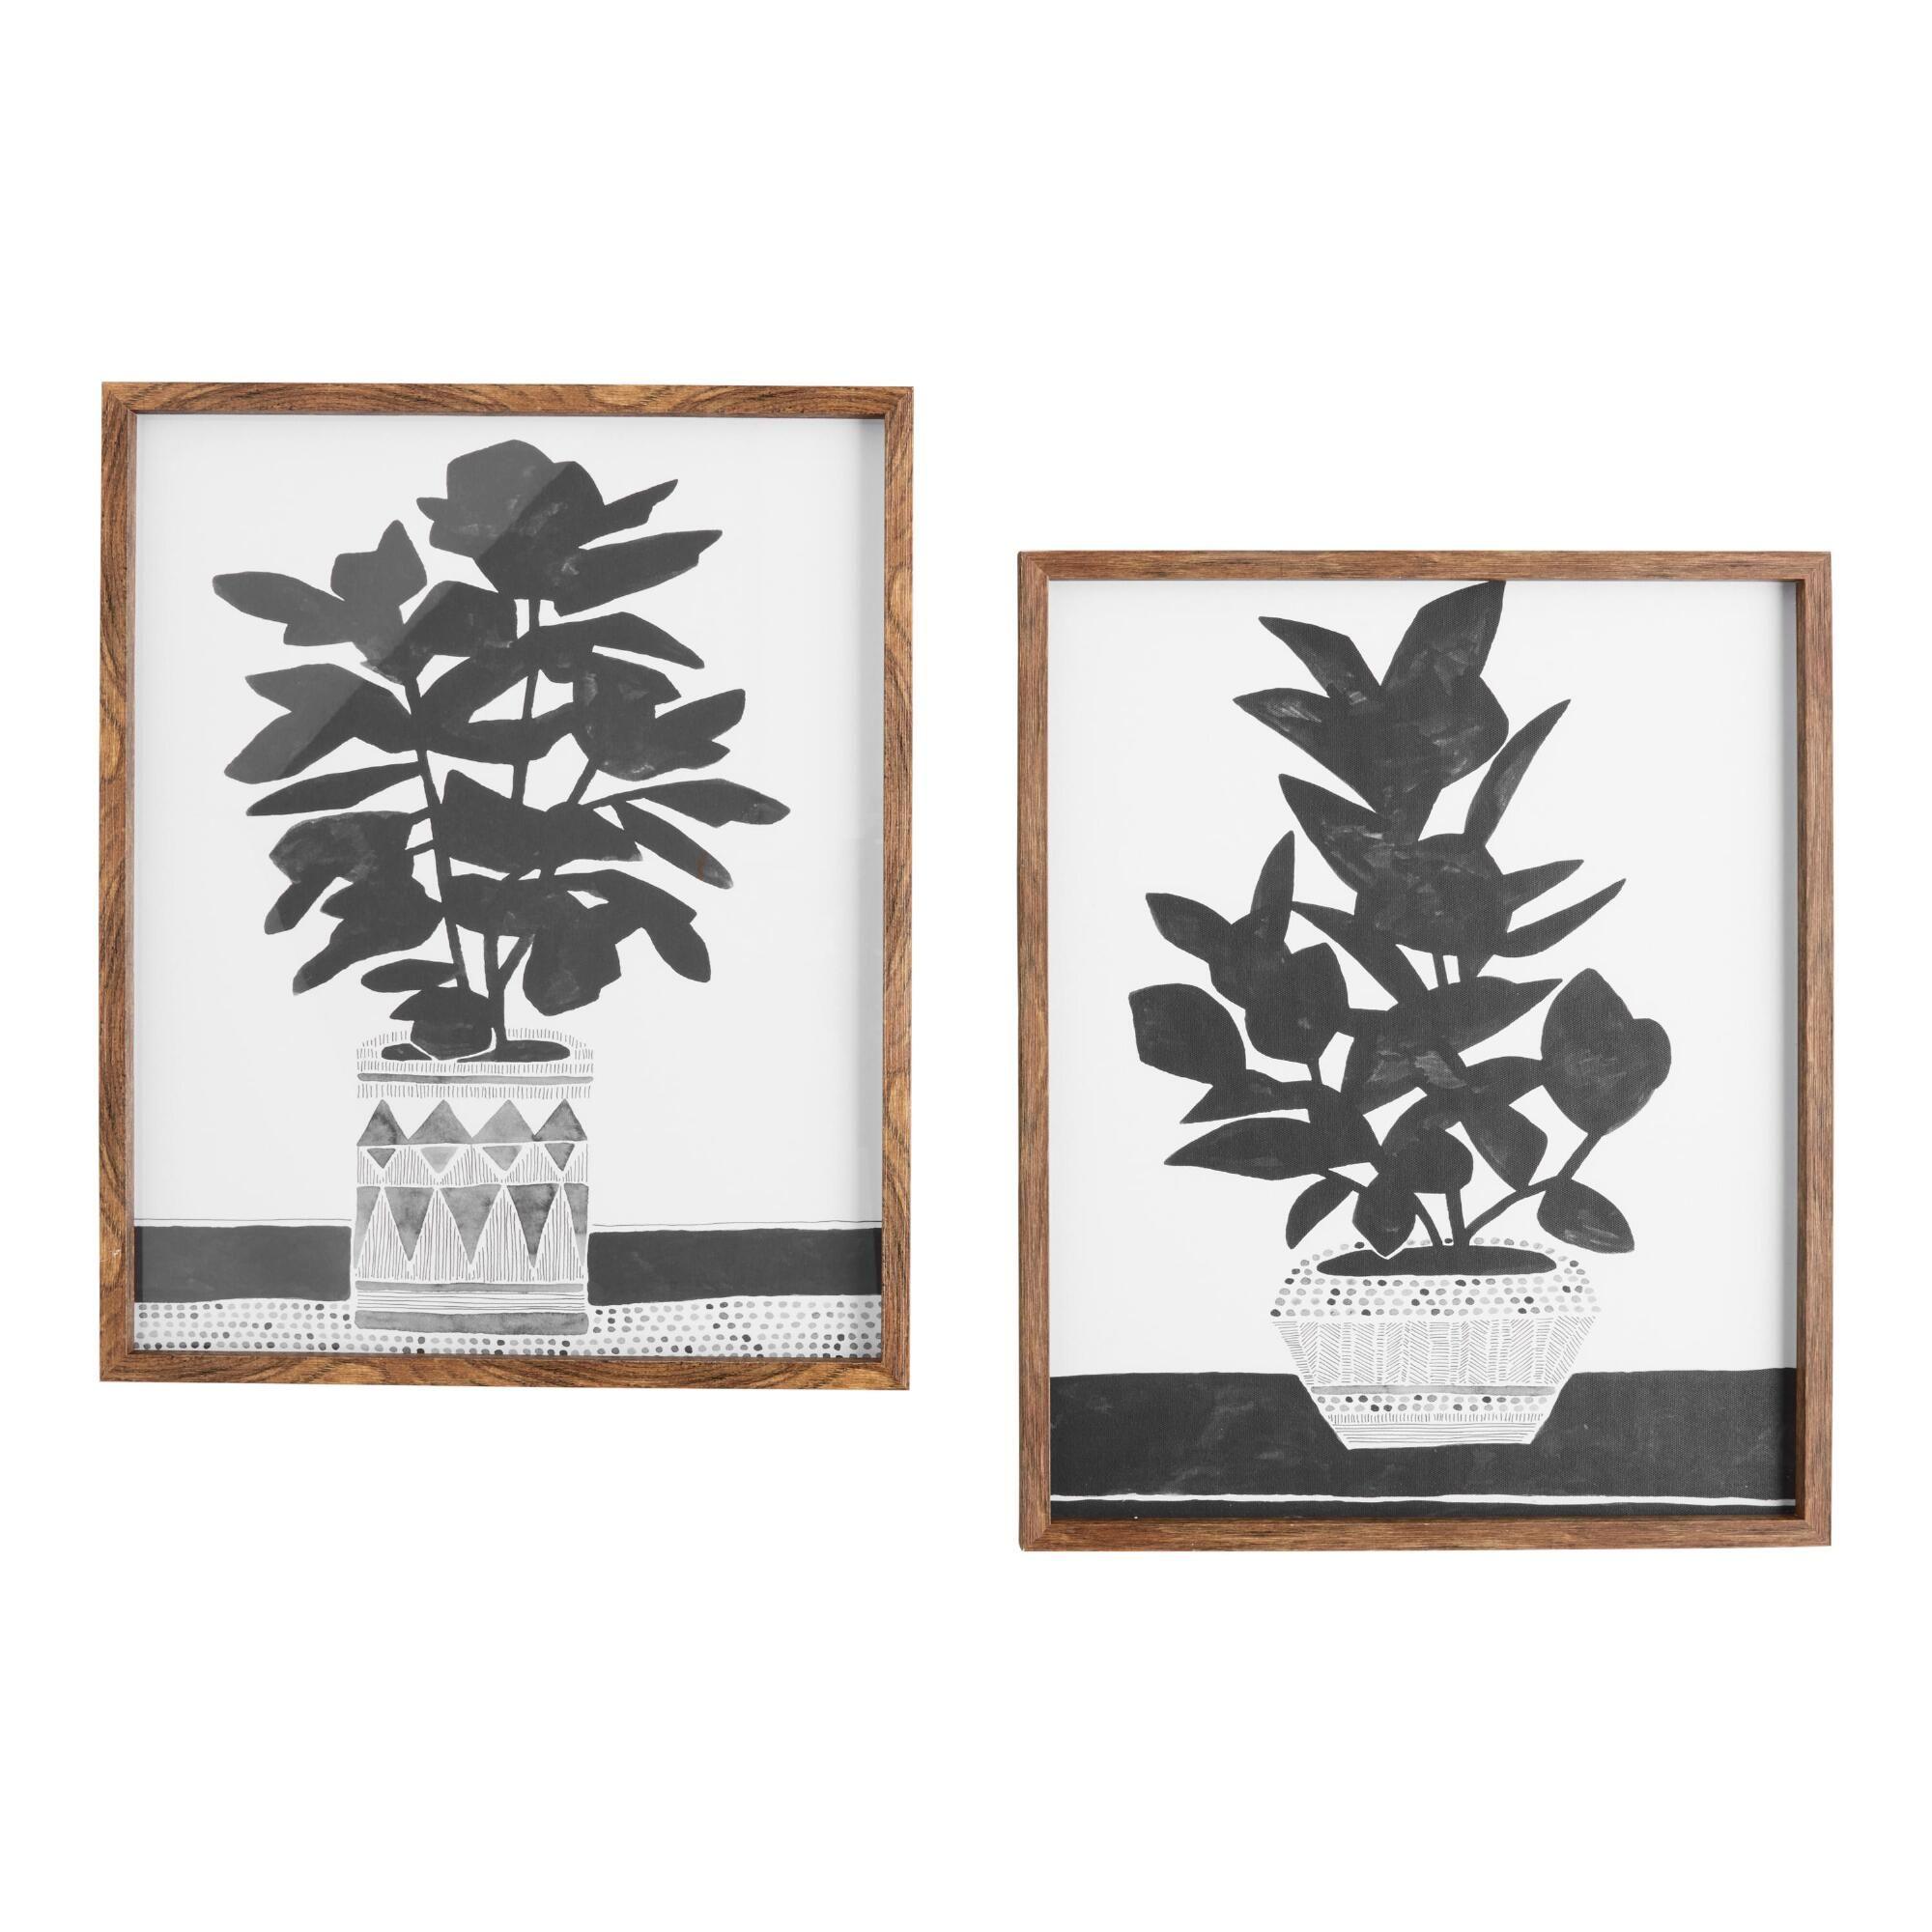 Namos Planted By Kristine Hegre Framed Wall Art Set Of 2 In 2020 Framed Wall Art Sets Wall Art Sets Framed Wall Art